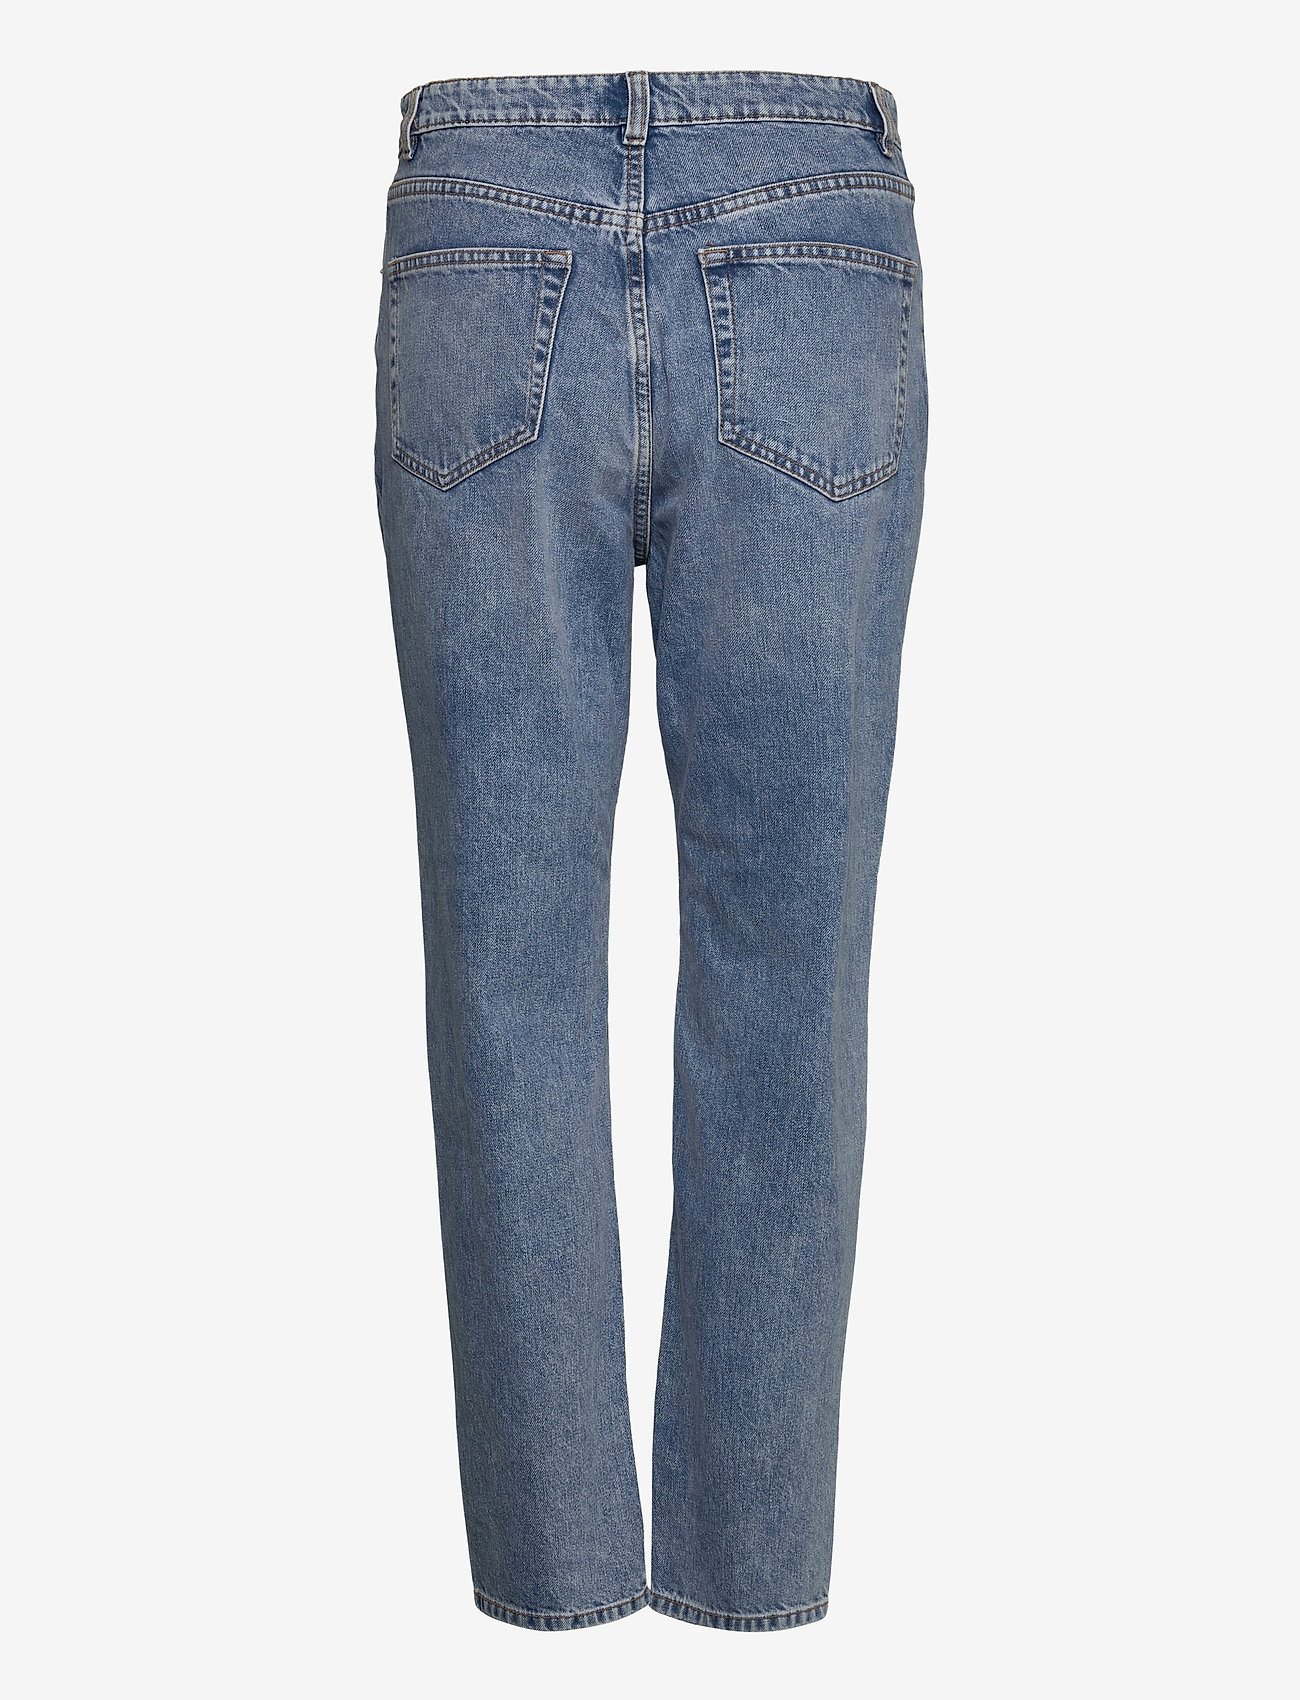 Lindex - Trousers denim Malin blue - slim jeans - light denim - 1